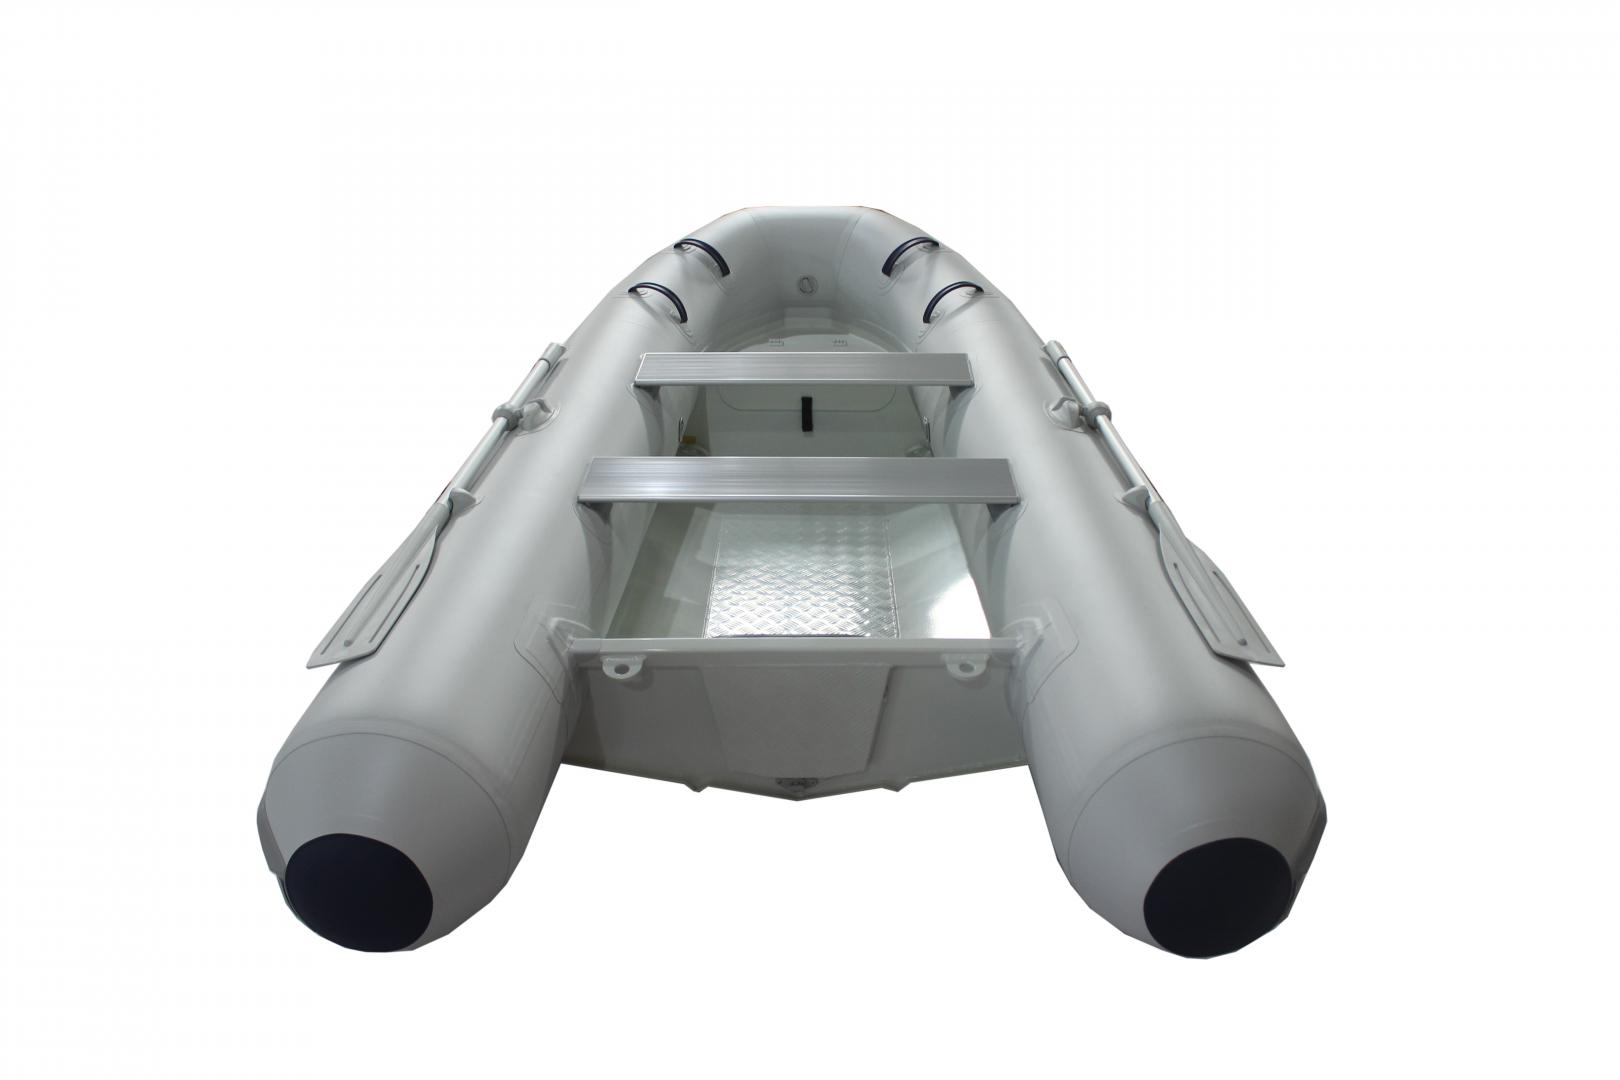 Brand new Mercury 3 20m Aluminium hypalon RIB (new release)